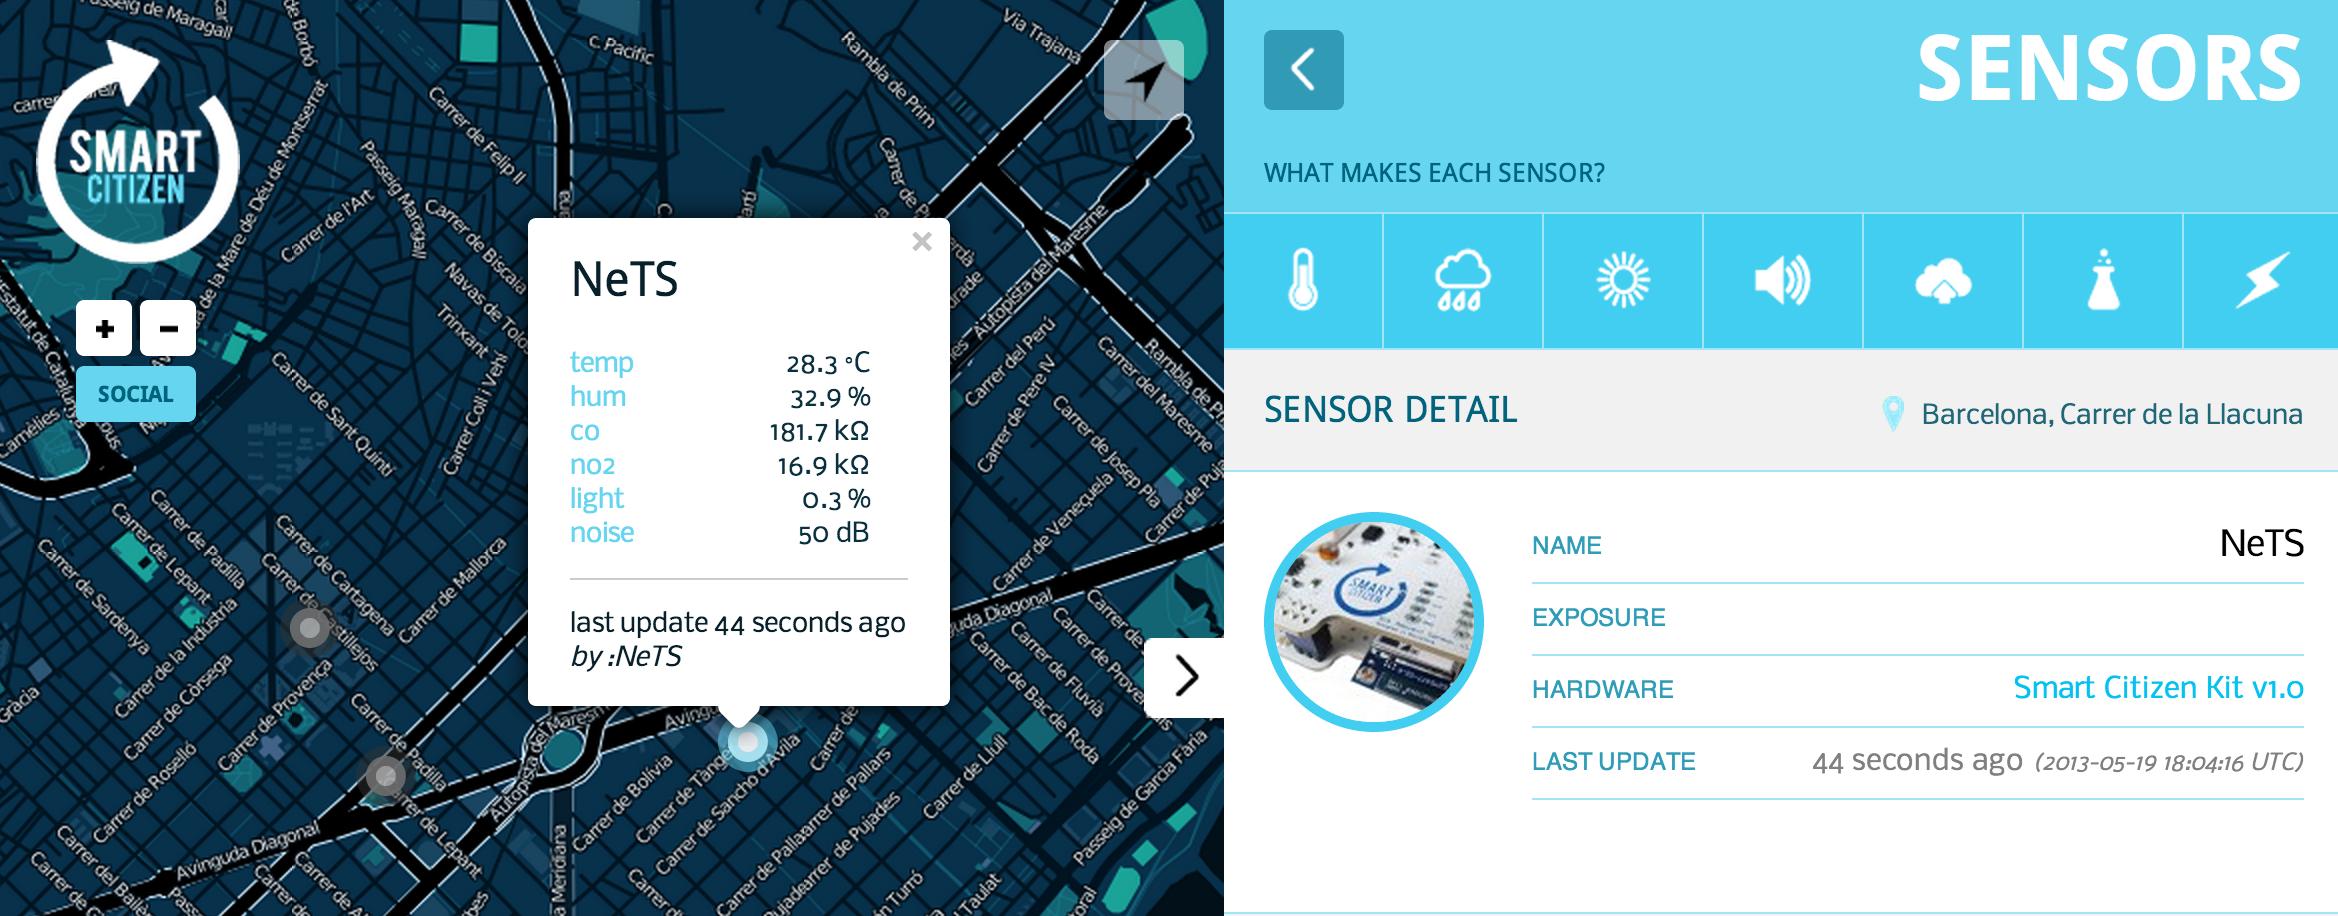 sc-sensors